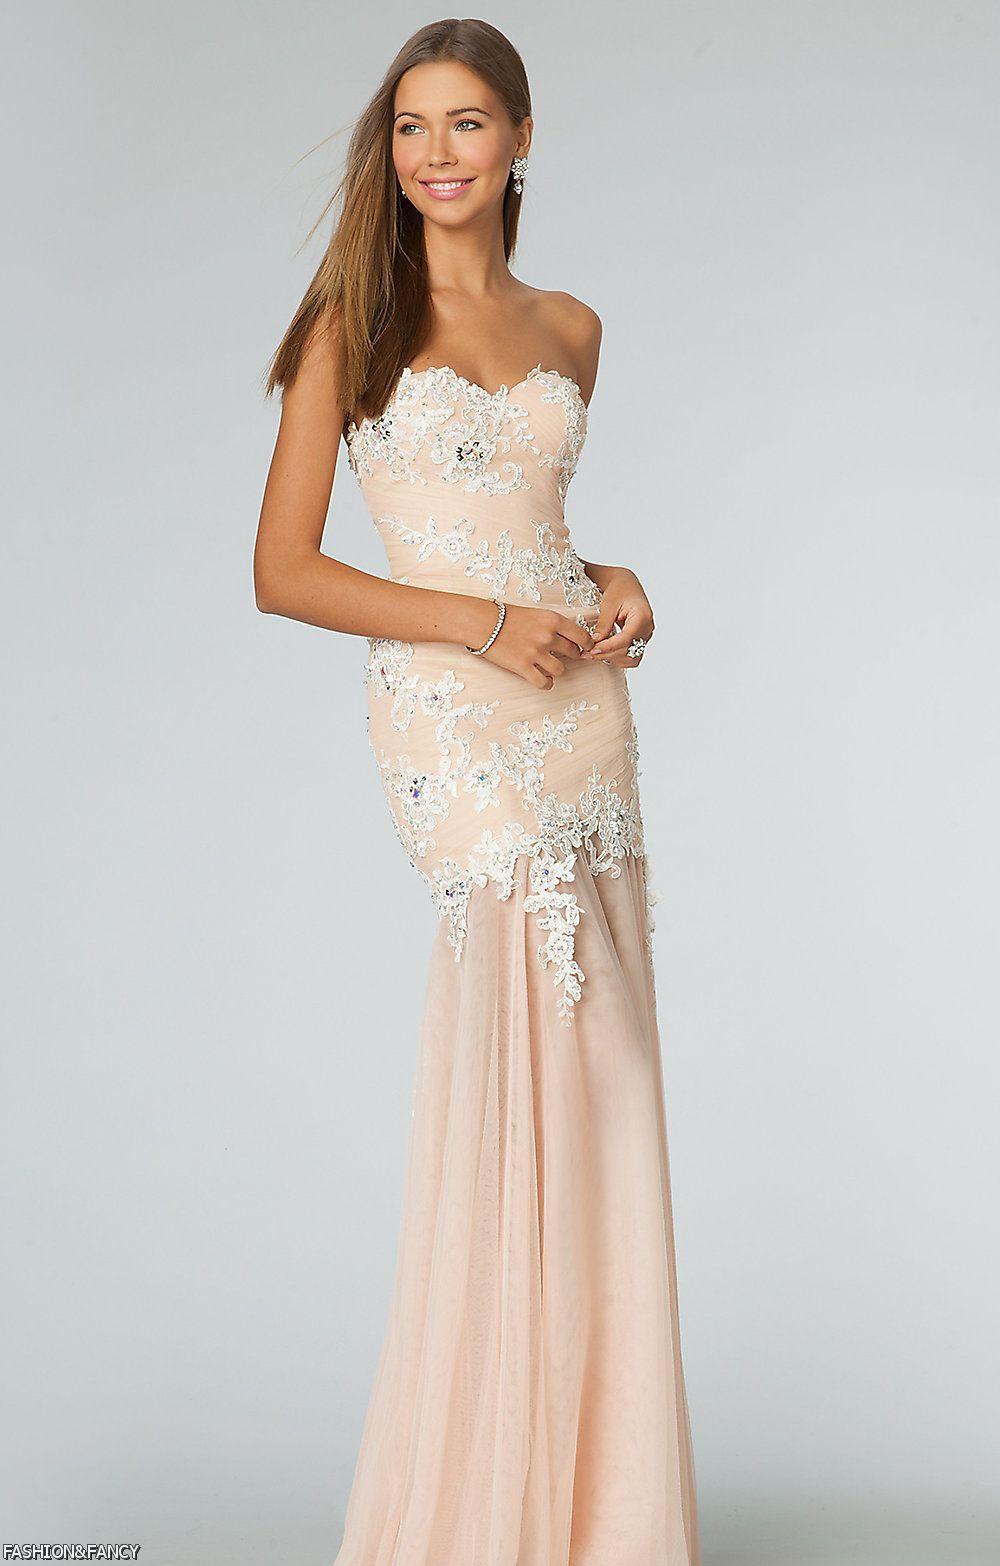 1920 wedding dress   fashion dresses  Sequin Embellished Long Sleeve Lace Formal